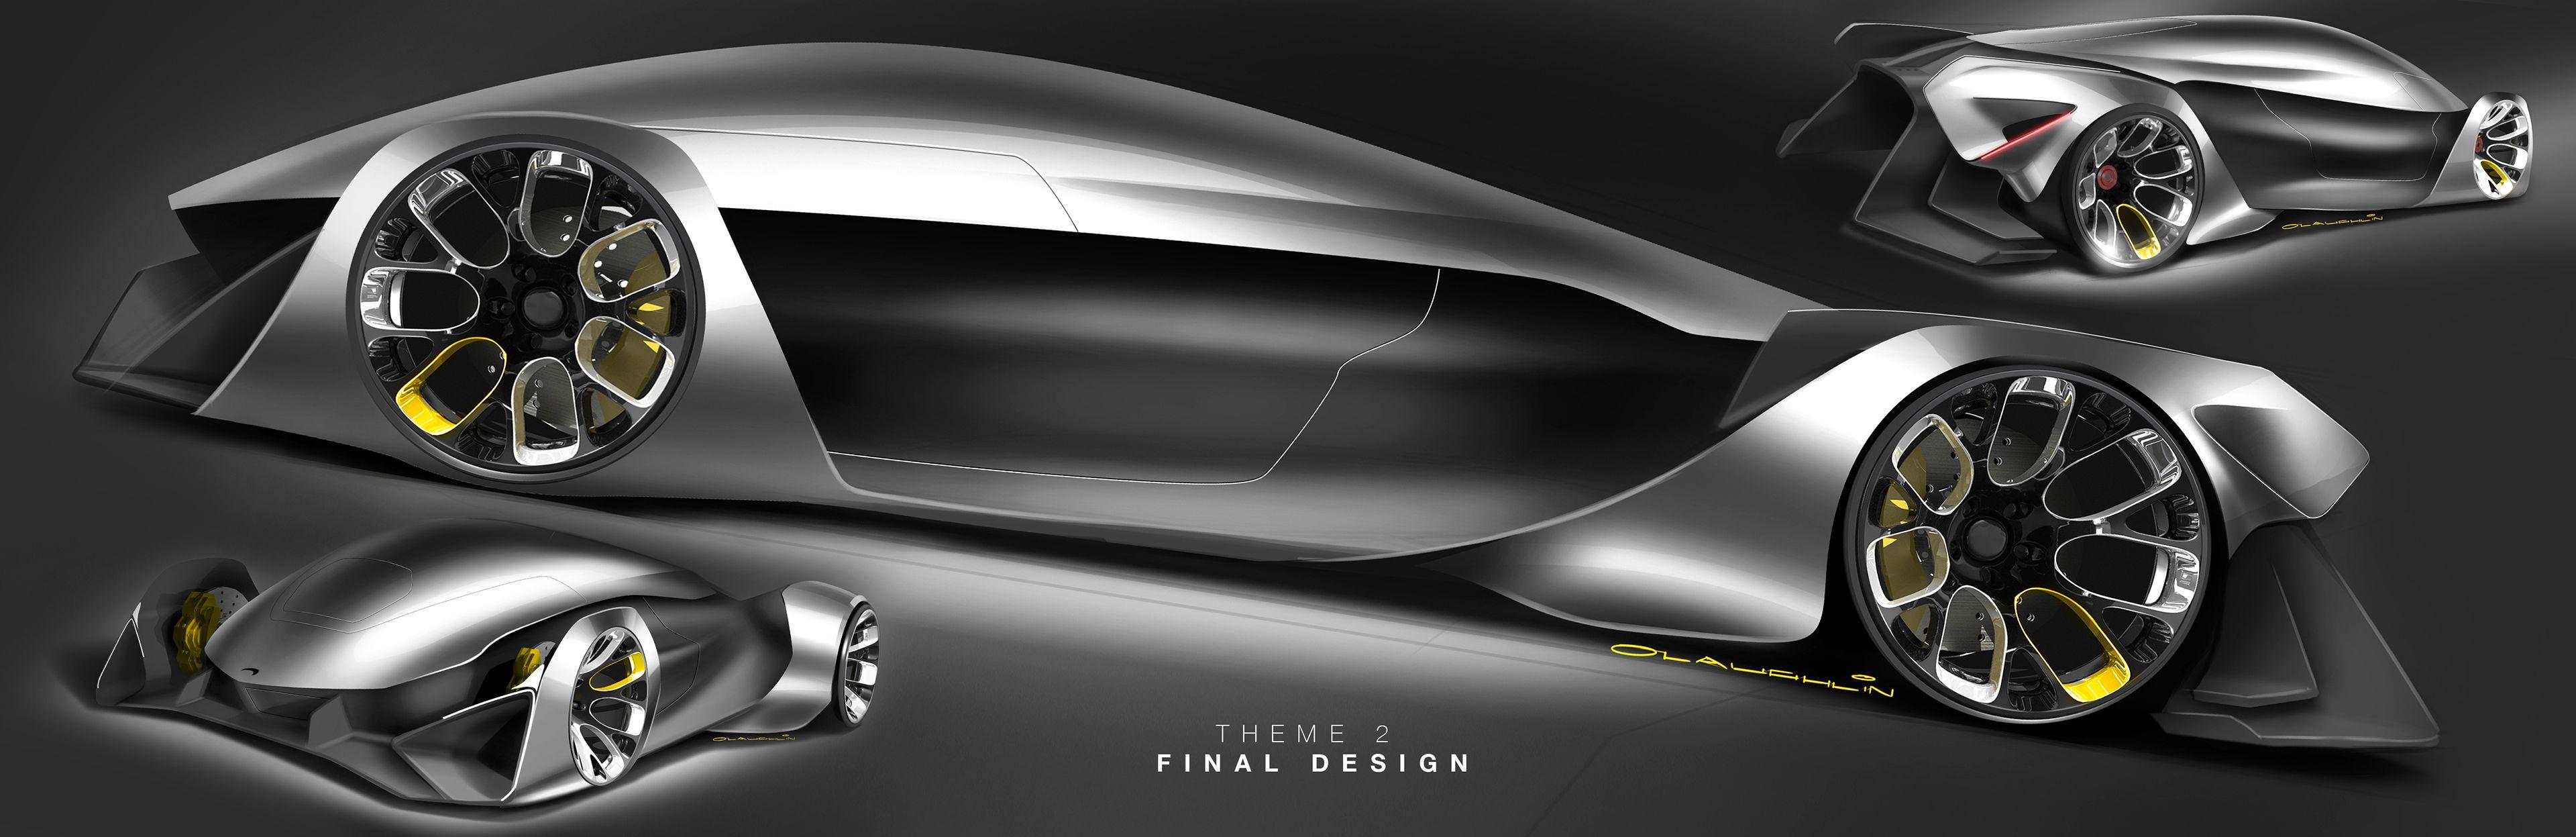 Mclaren Supercar Sketch Project On Behance Car Body Design